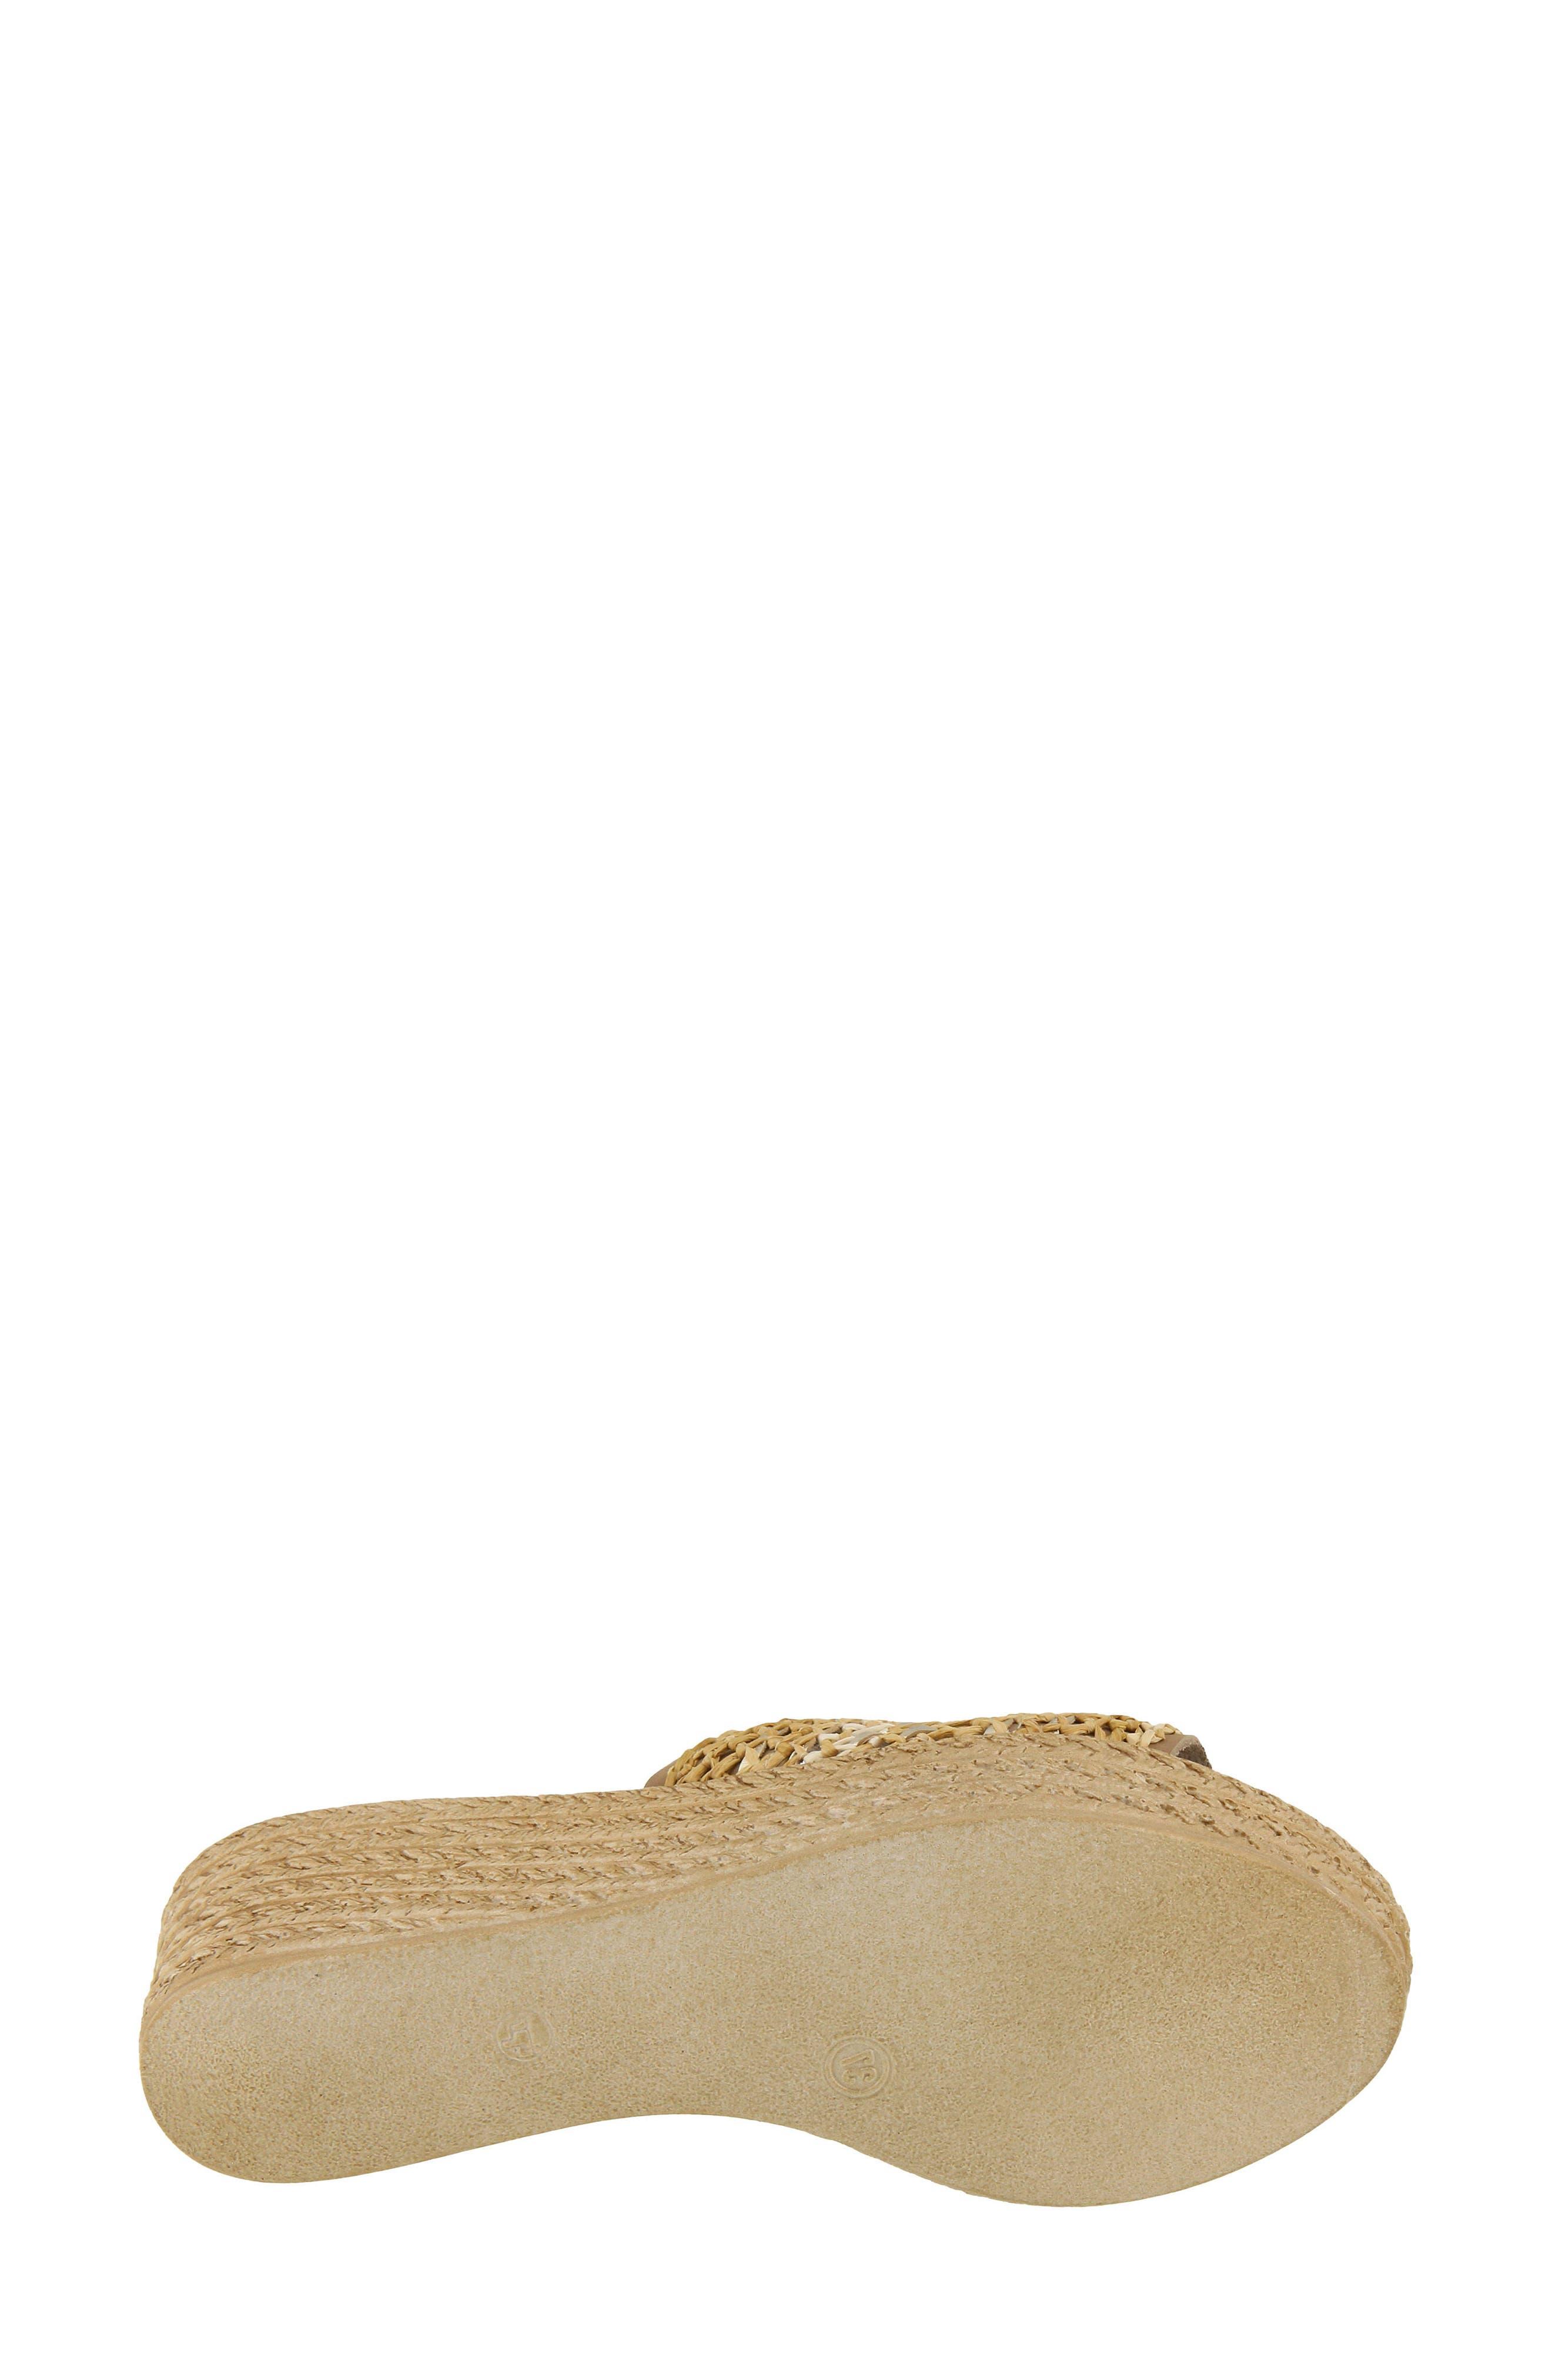 Calci Espadrille Wedge Sandal,                             Alternate thumbnail 14, color,